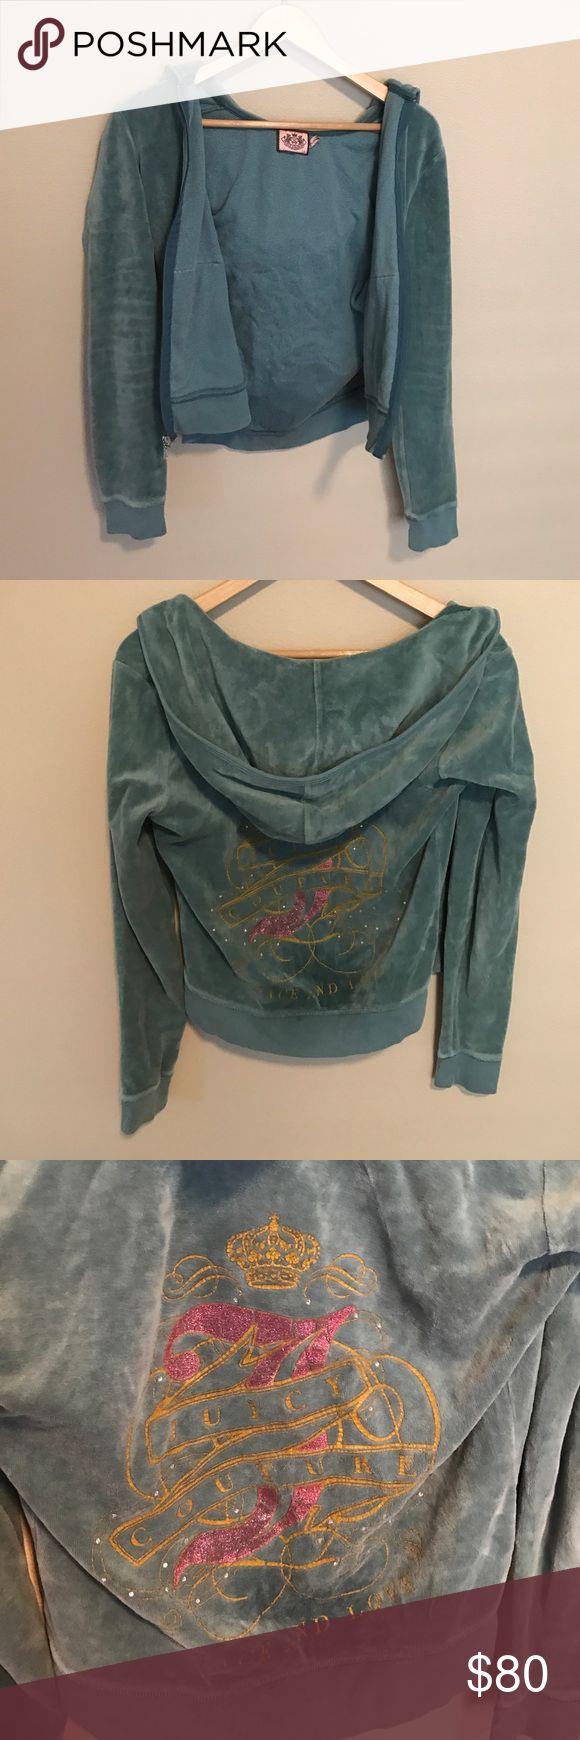 Juicy velour jacket Dark green juicy velour track jacket Juicy Couture Jackets & Coats